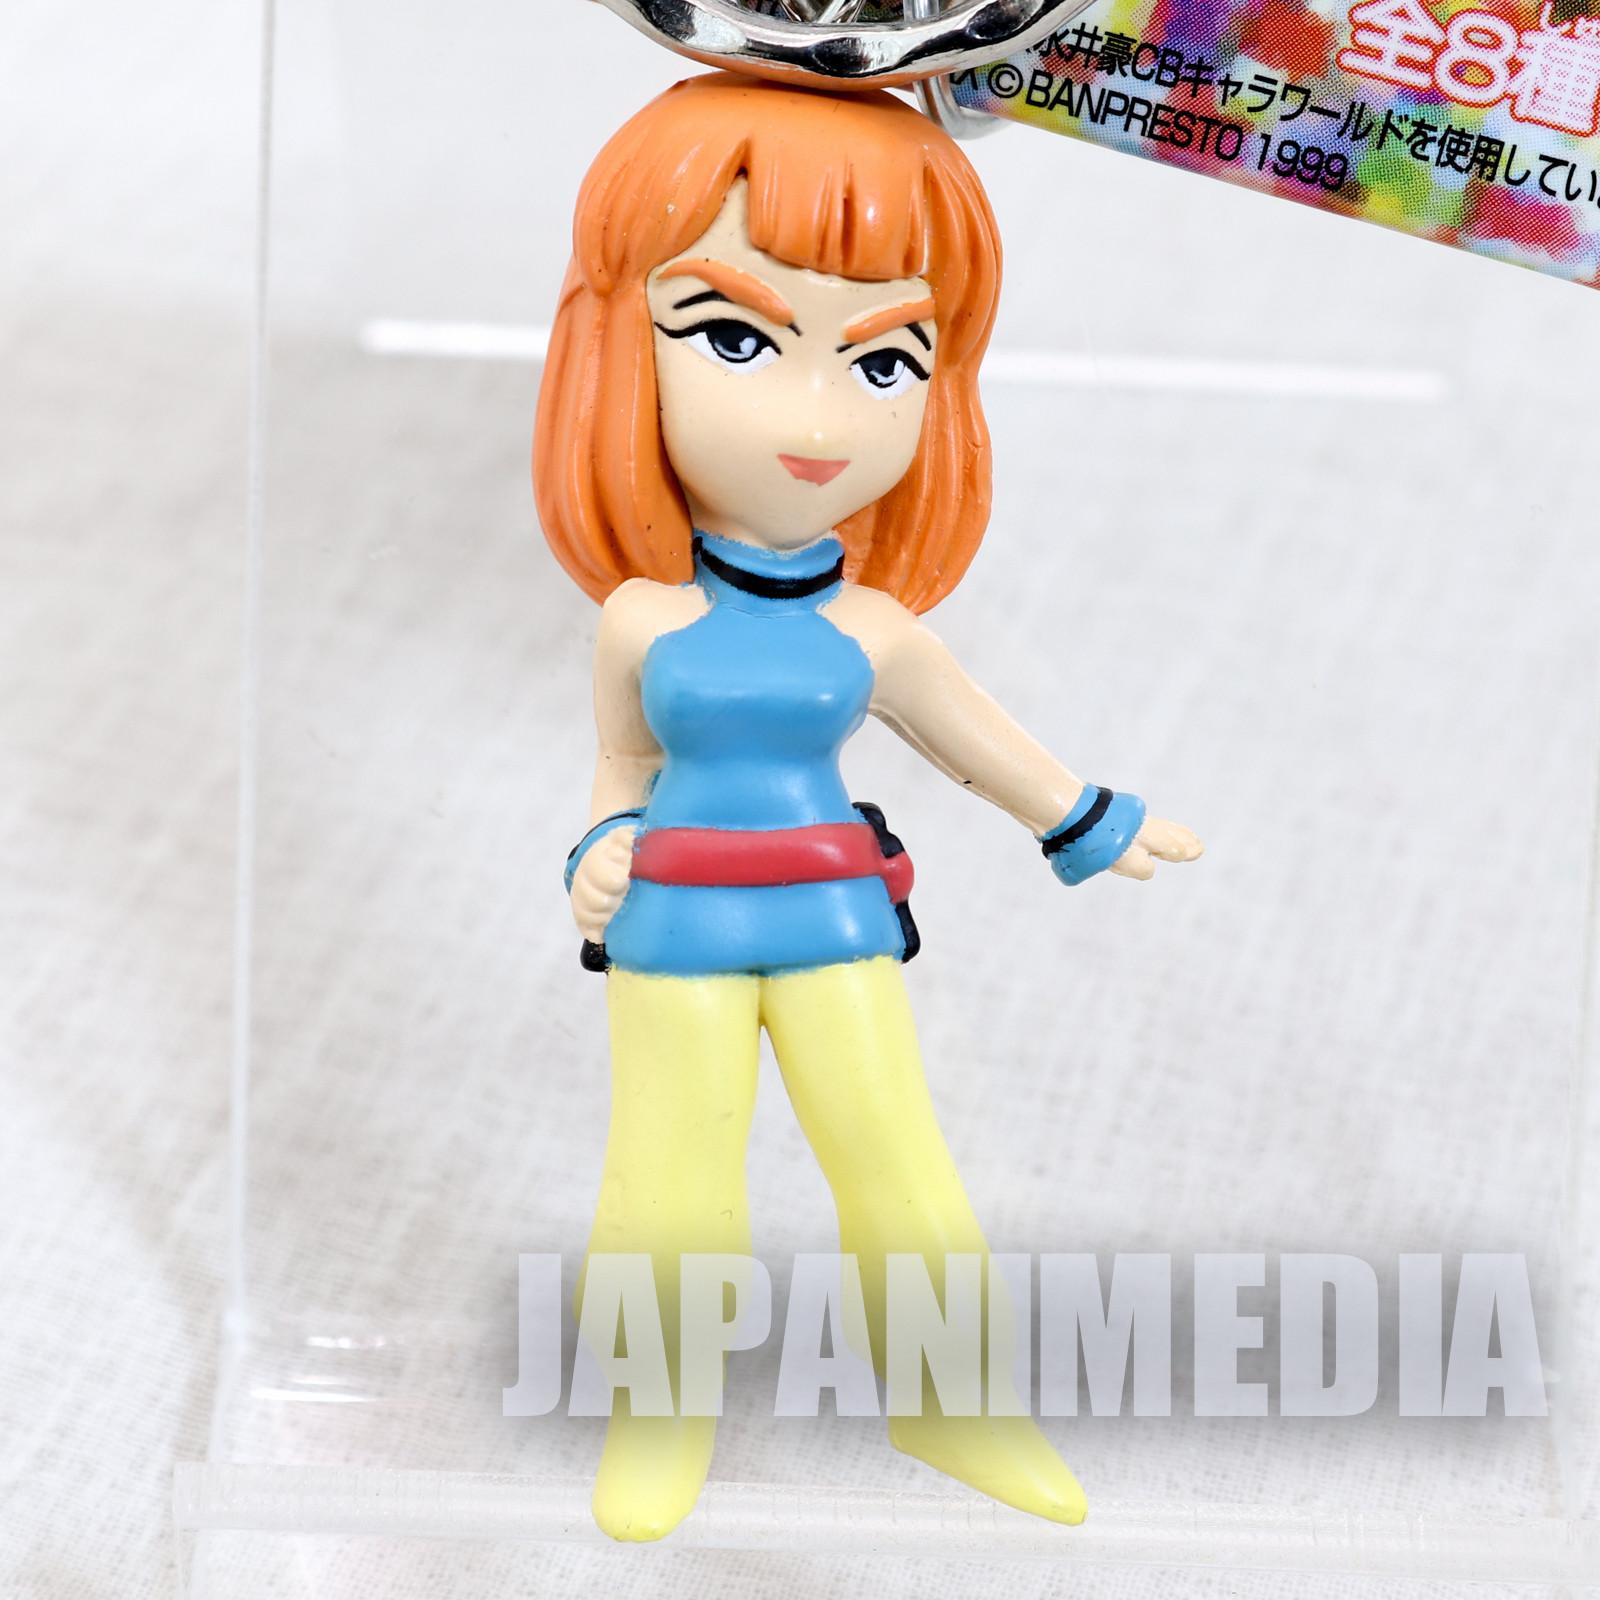 Aura Battler Dunbine Marvel Frozen Figure Key Chain Super Robot Wars JAPAN ANIME